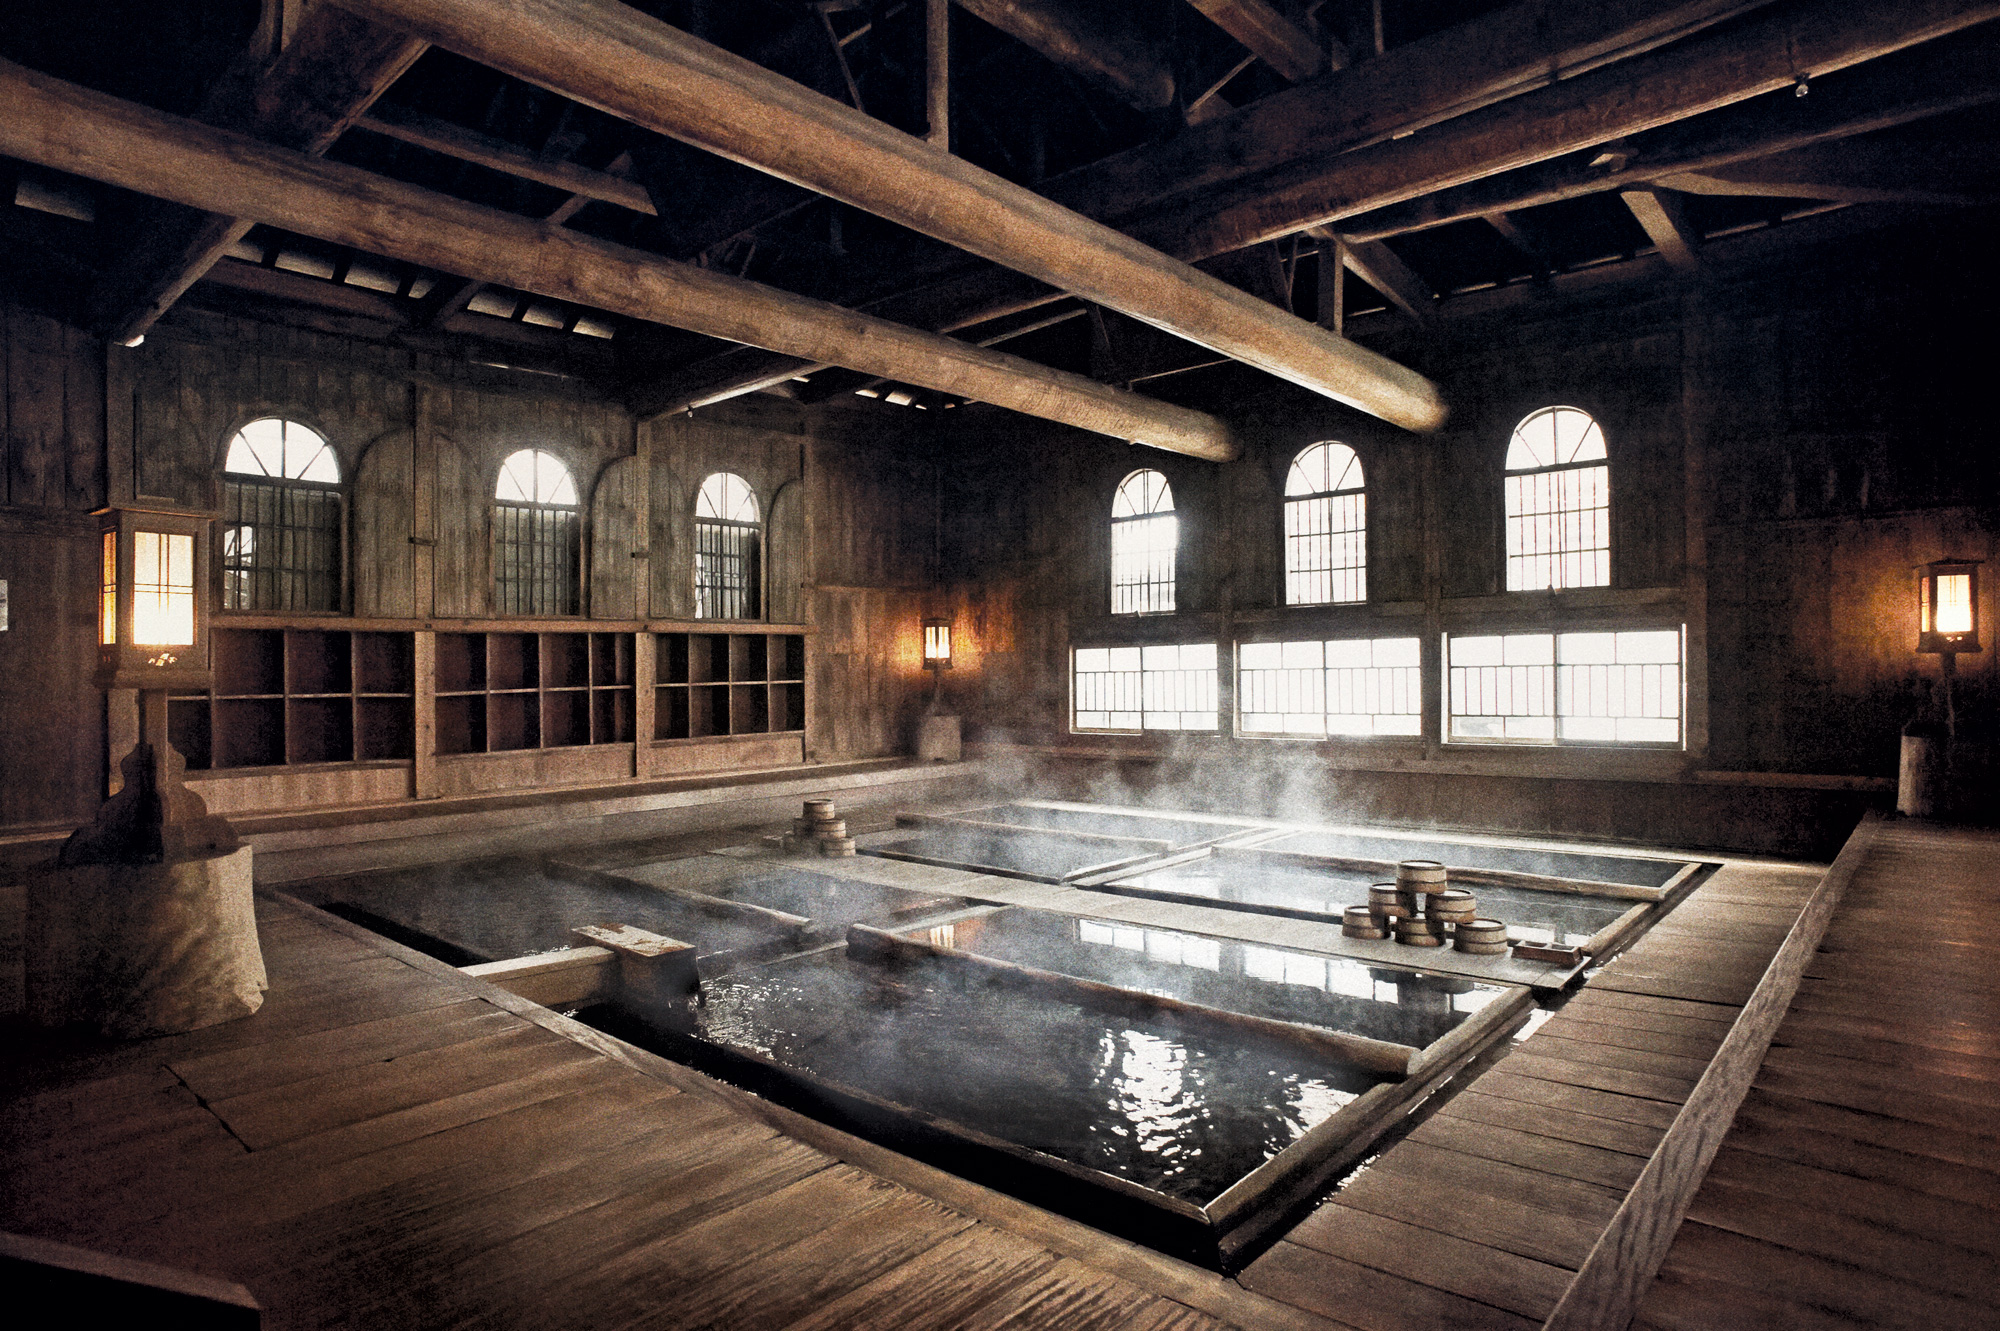 SPA & WELLNESS_ TRIP_  HOSHI CHOJUKAN ONSEN.  #Onsen #Tradition #Japan #DayTrip #Relaxation   http://hoshi-onsen.com/english/